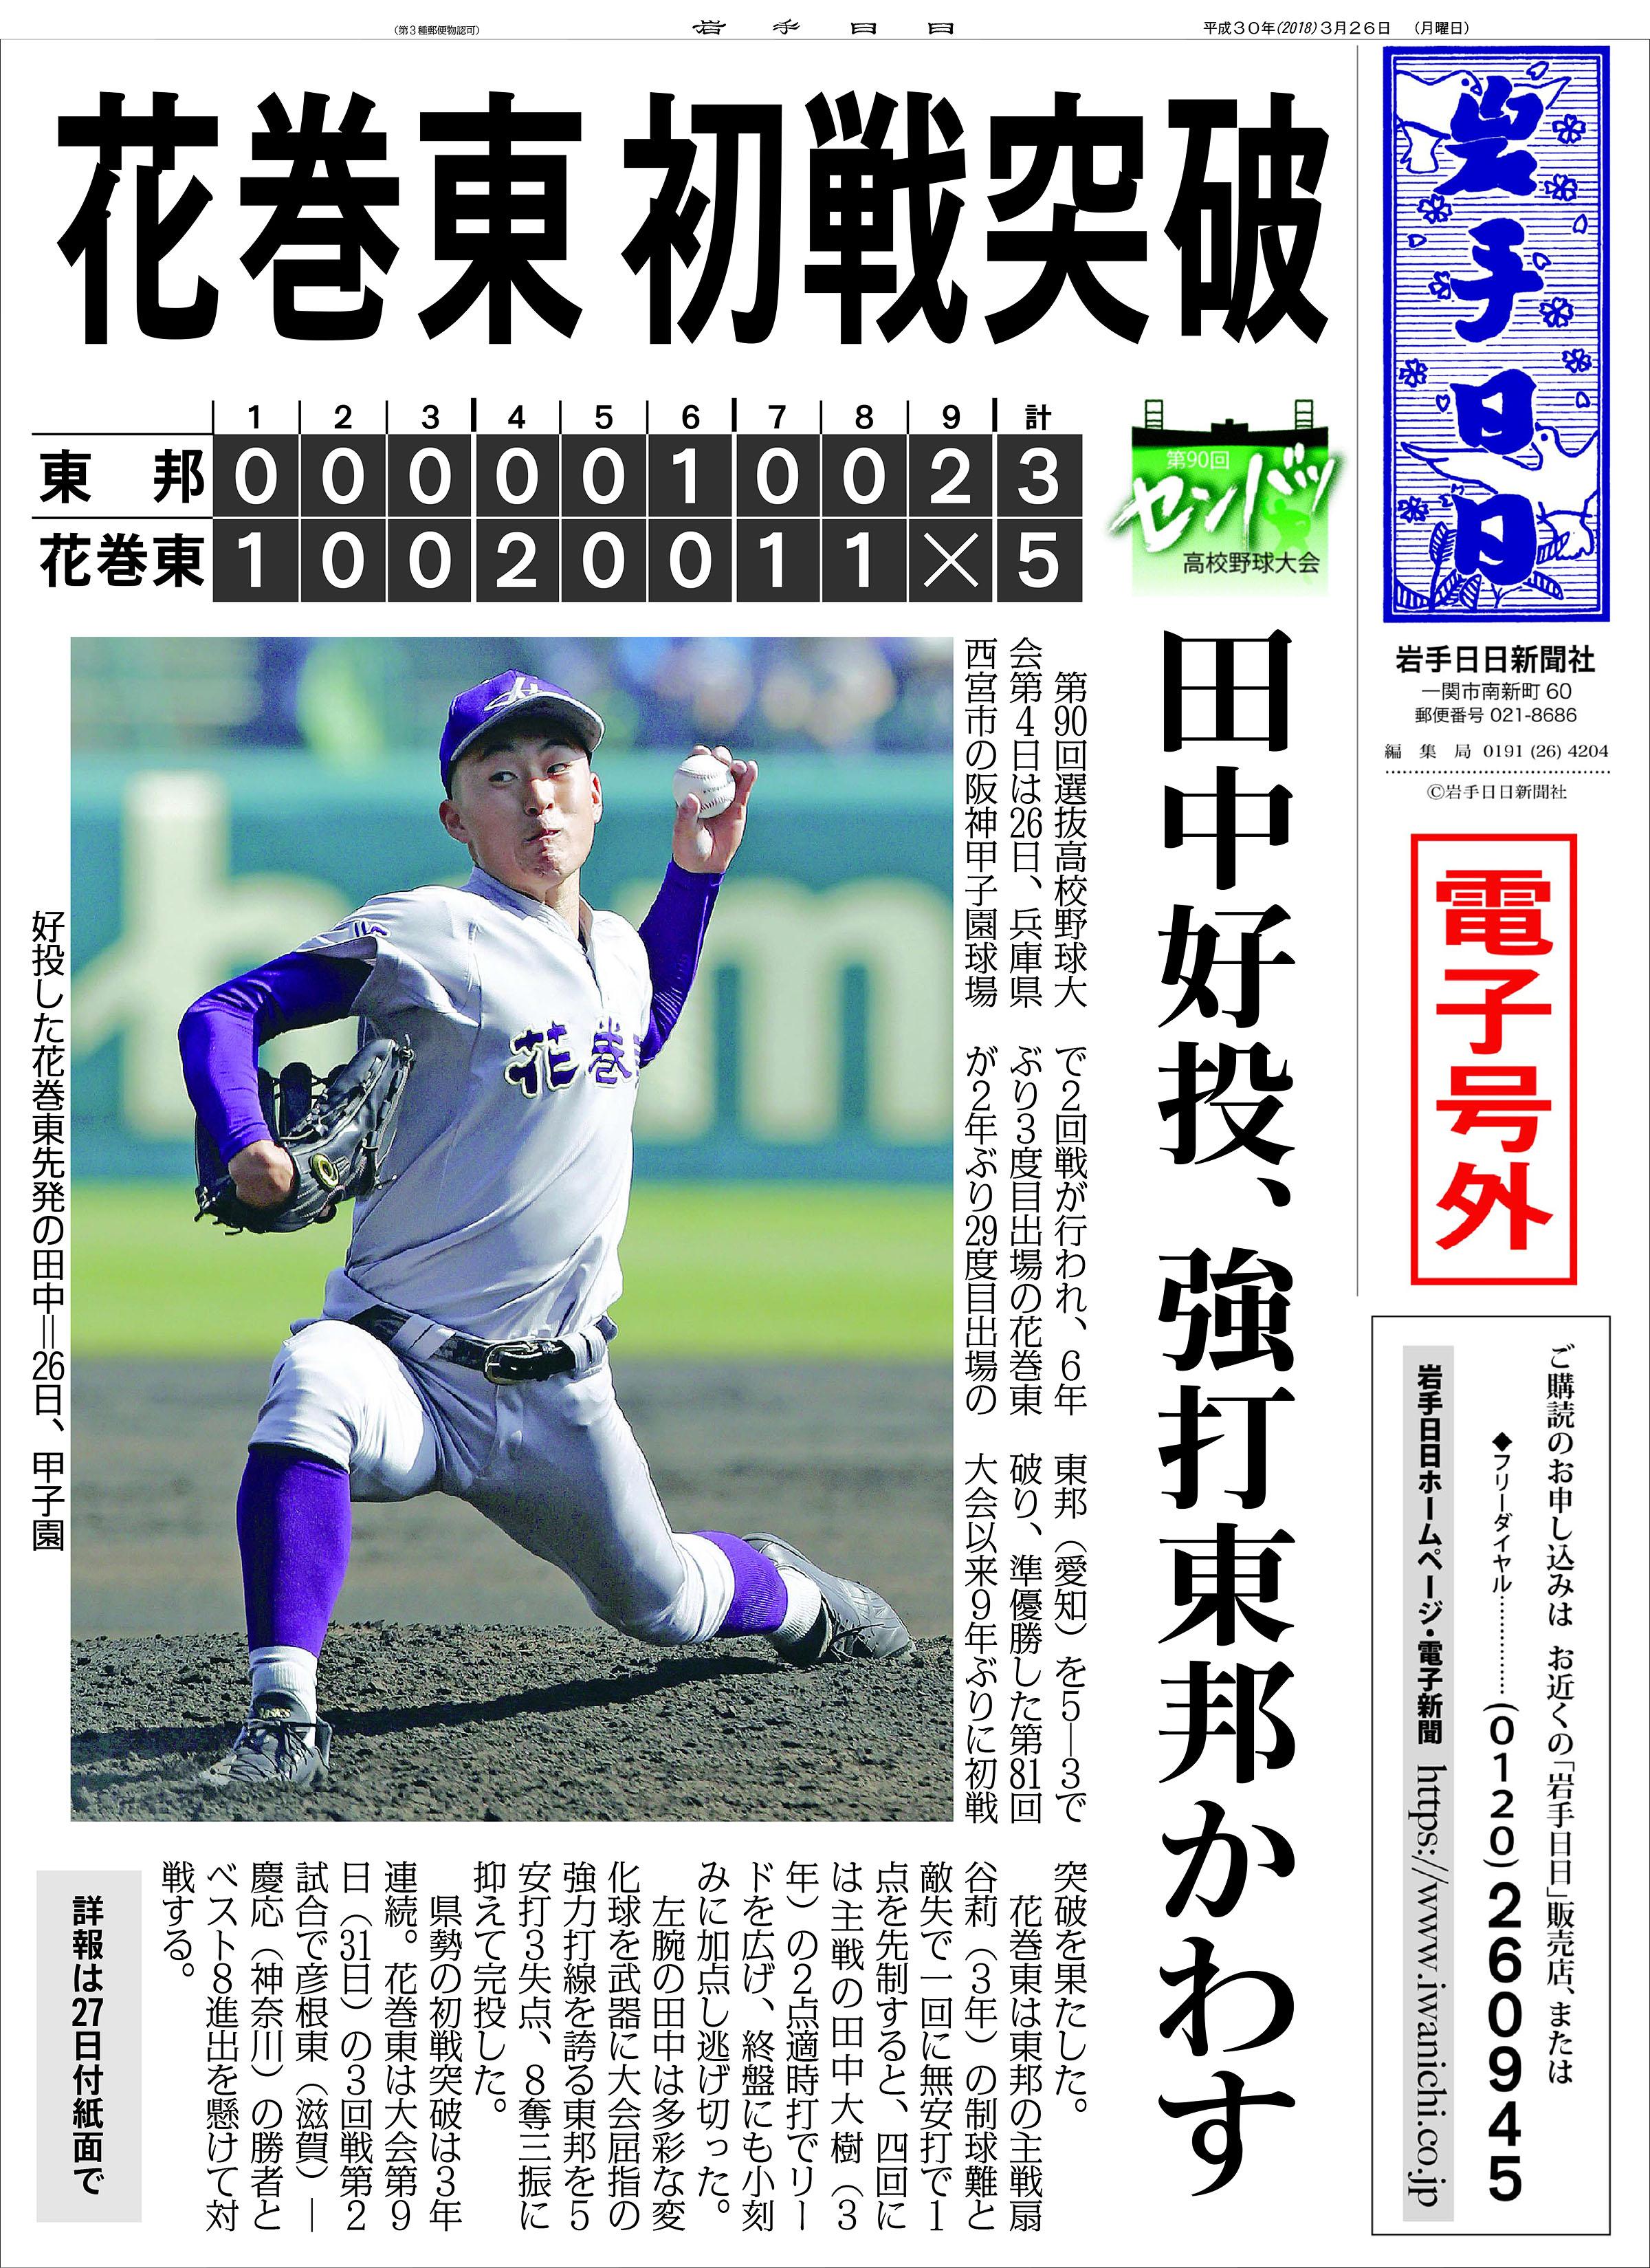 【電子号外】花巻東 第90回センバツ高校野球